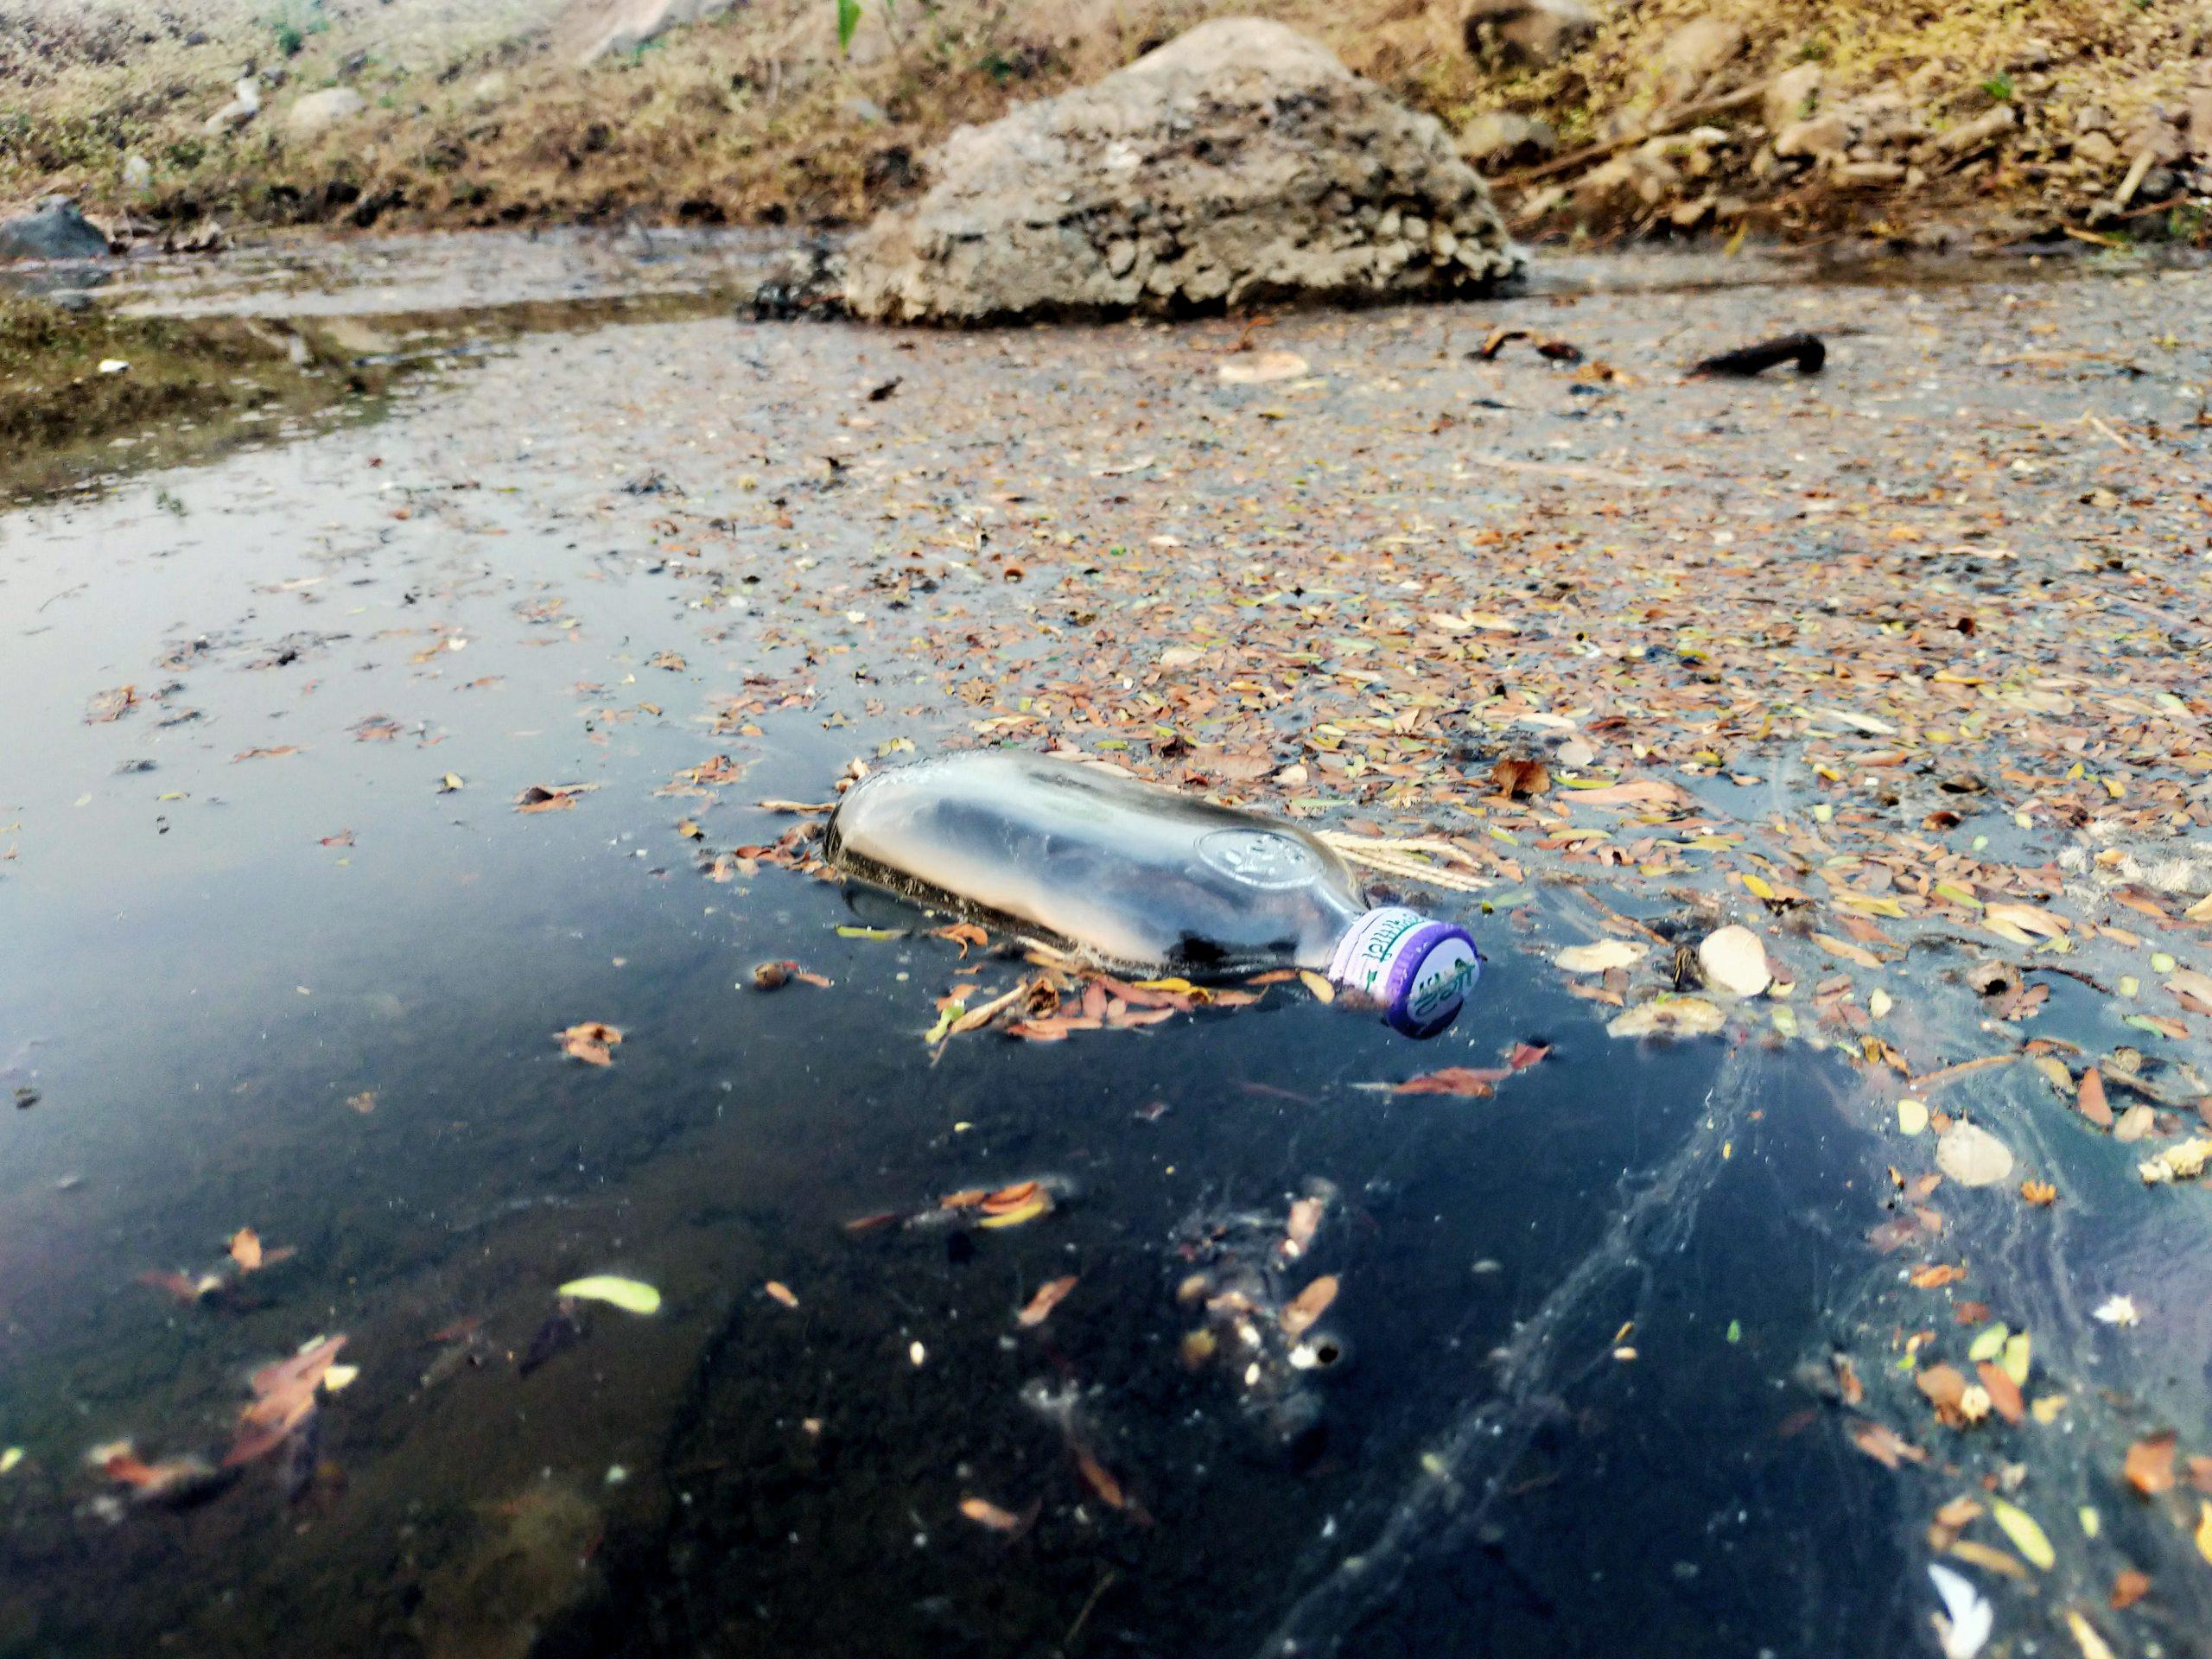 A glass bottle in dirty water